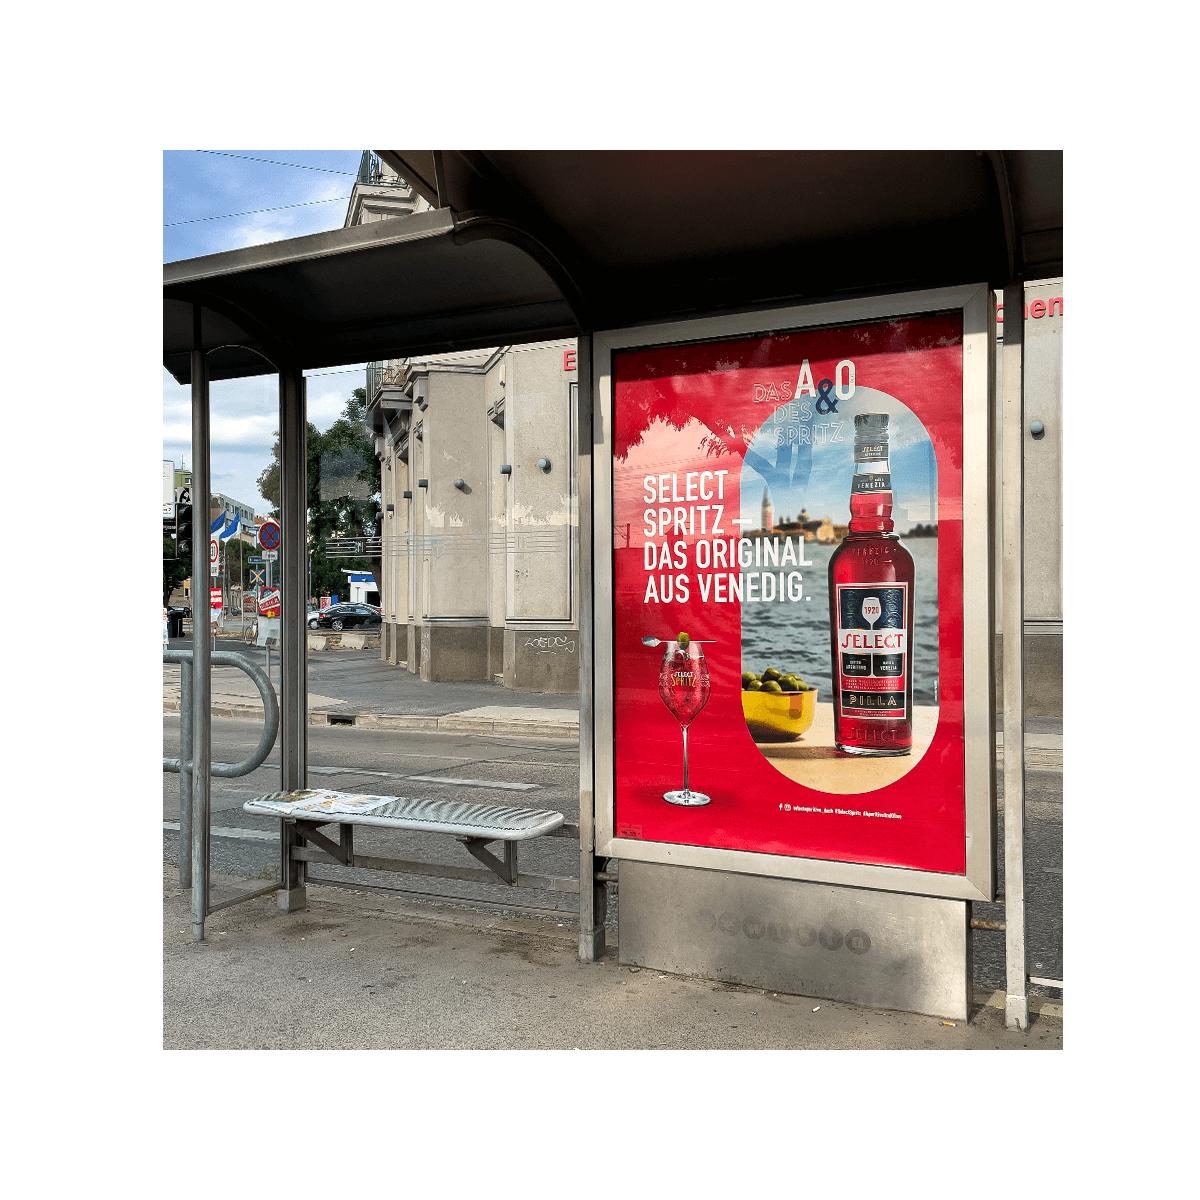 GK_PB_SEL-Kampagne-Carousel-1-2